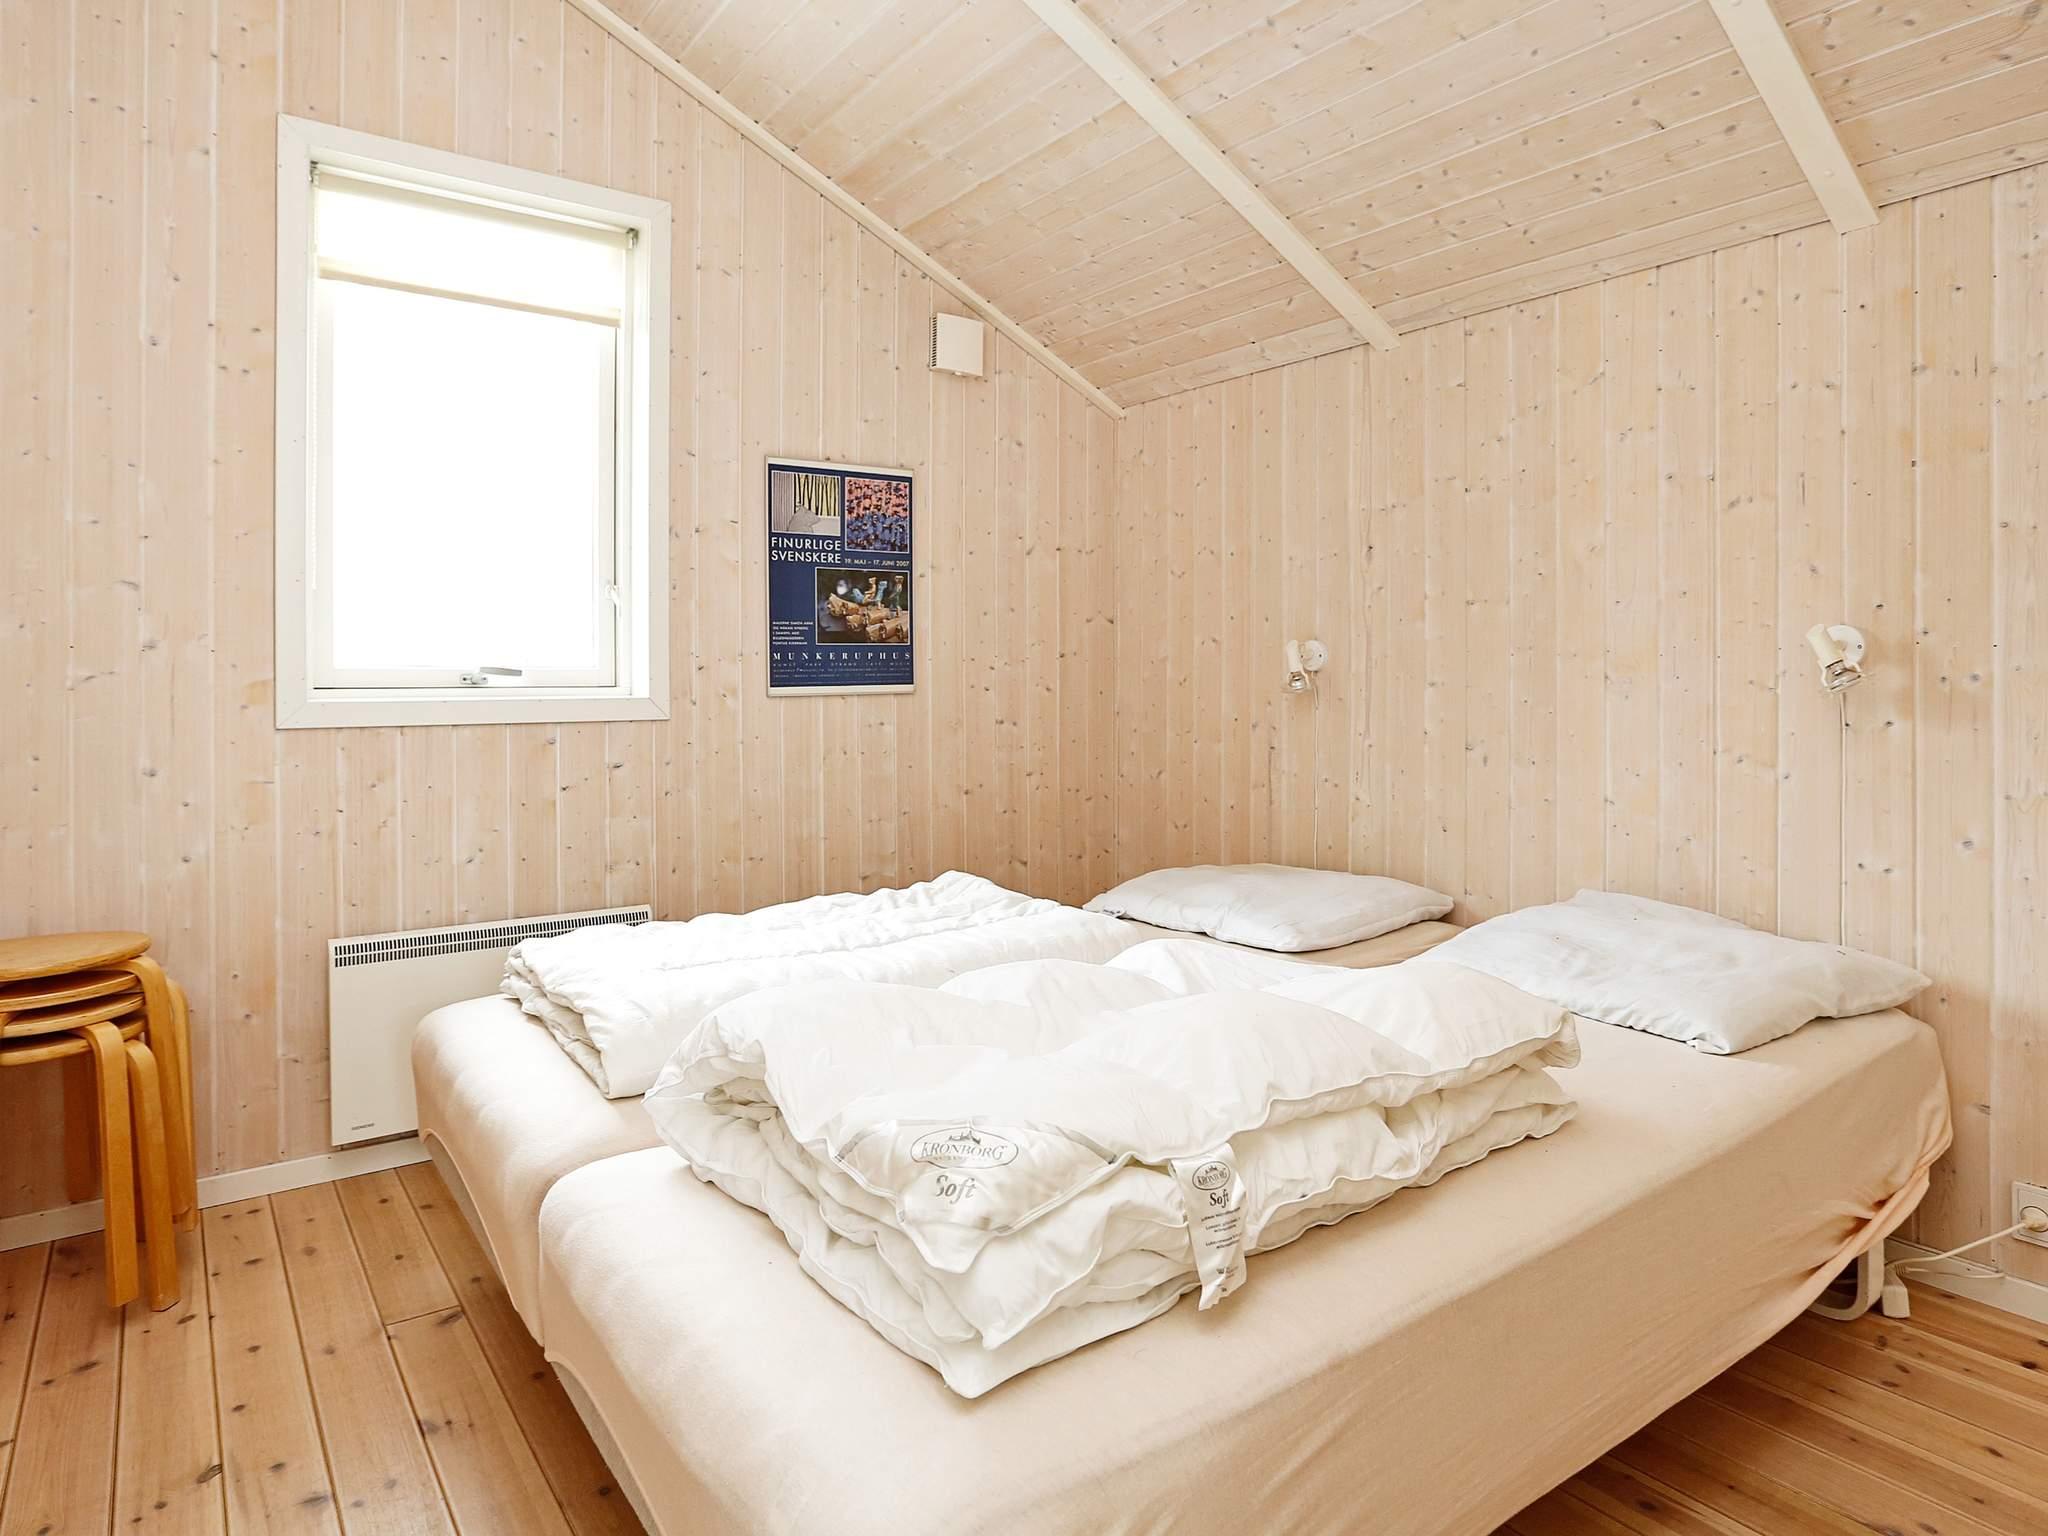 Ferienhaus Smidstrup Strand (86601), Smidstrup, , Nordseeland, Dänemark, Bild 11